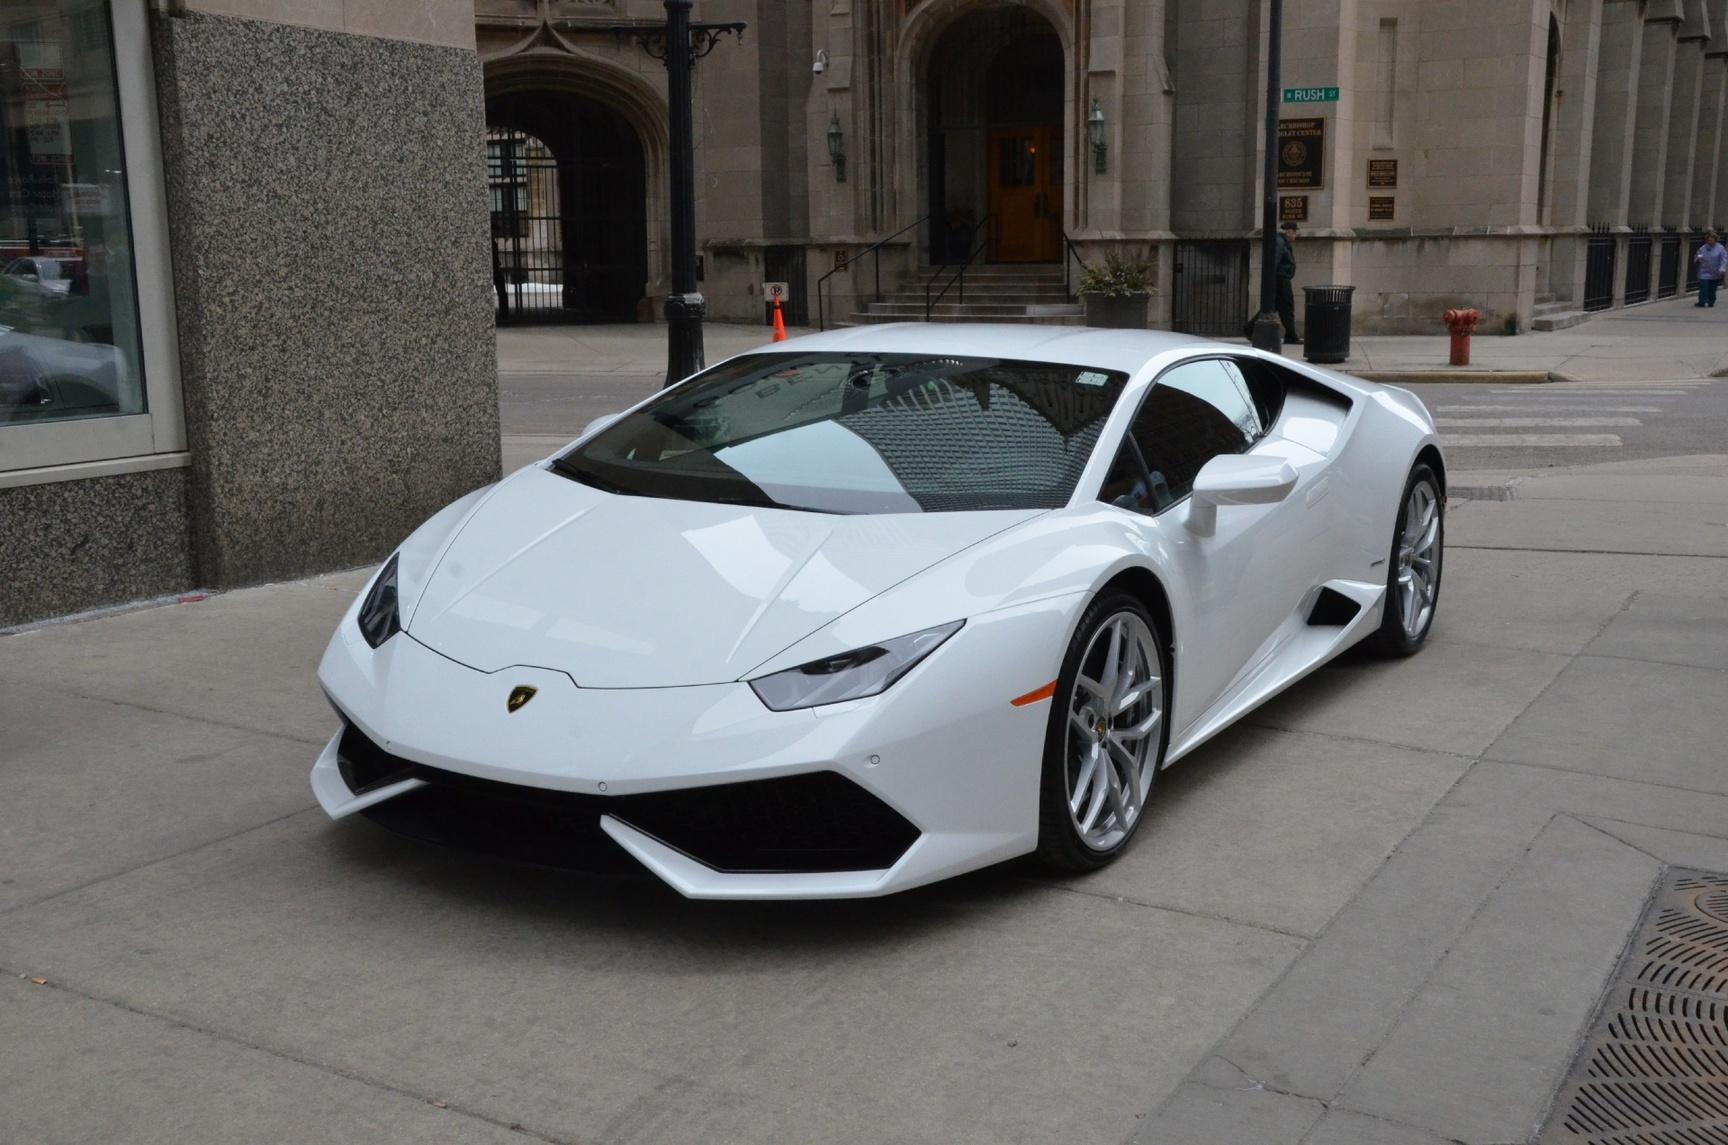 Lamborghini Huracan Hire Manchester Bradford Luton York